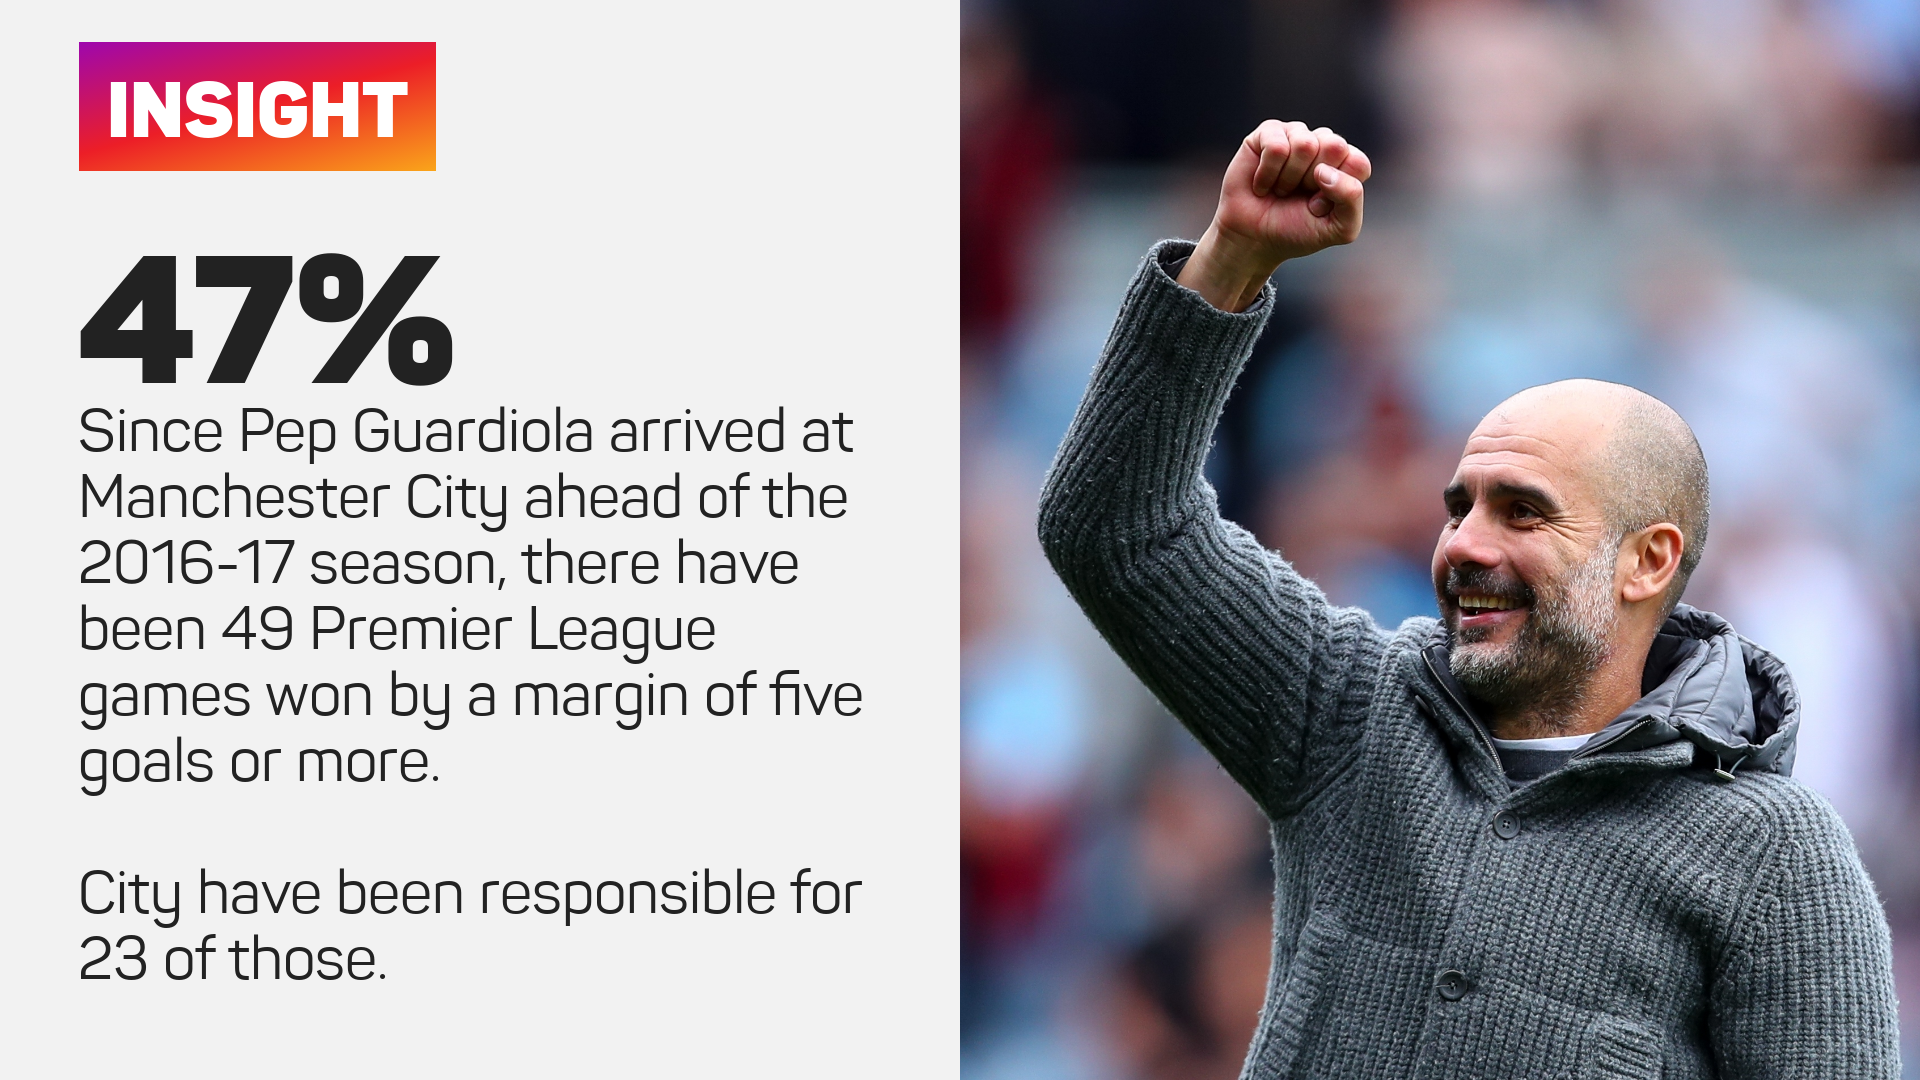 Man City have won 23 Premier League games by a margin of five goals or more under Pep Guardiola